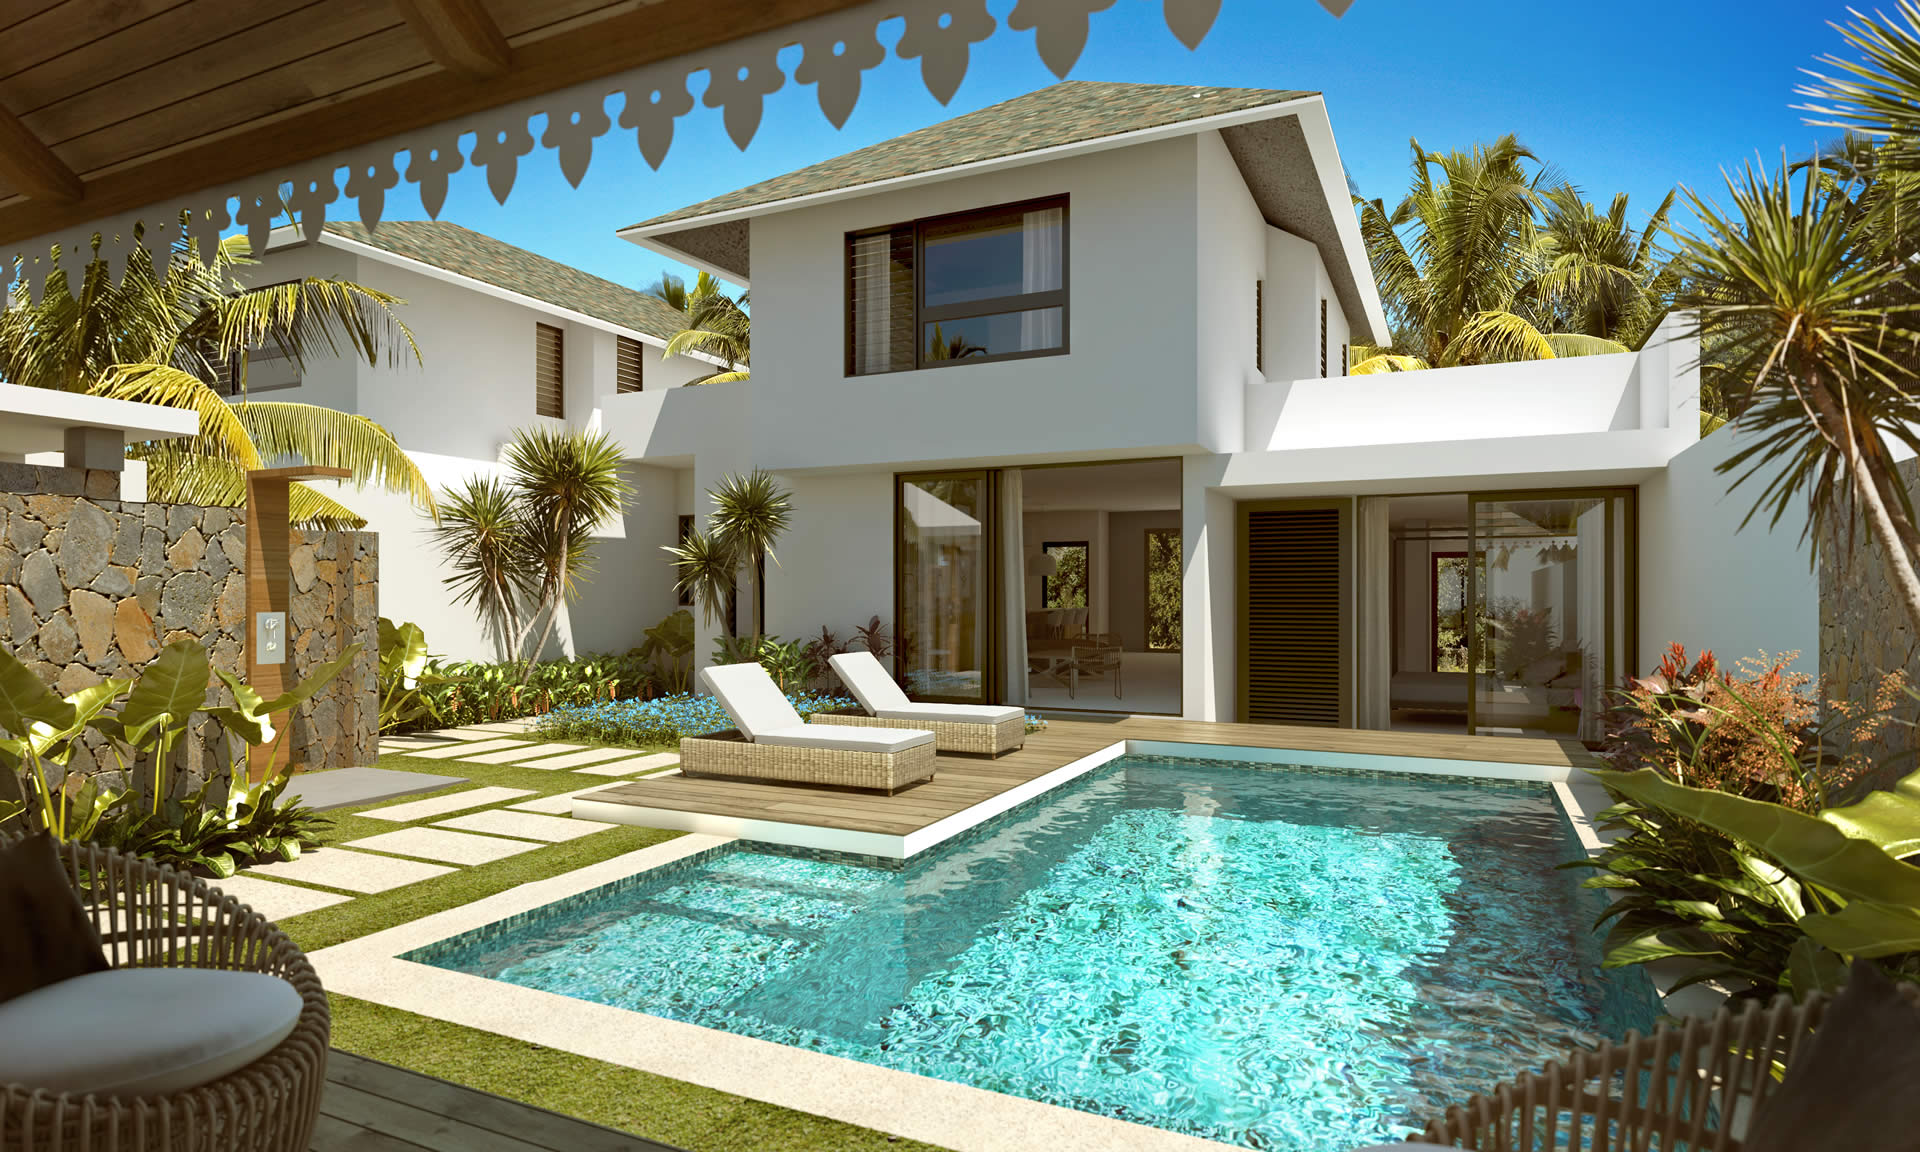 investissement immobilier reussir achat etranger acheter bien immobilier ile maurice